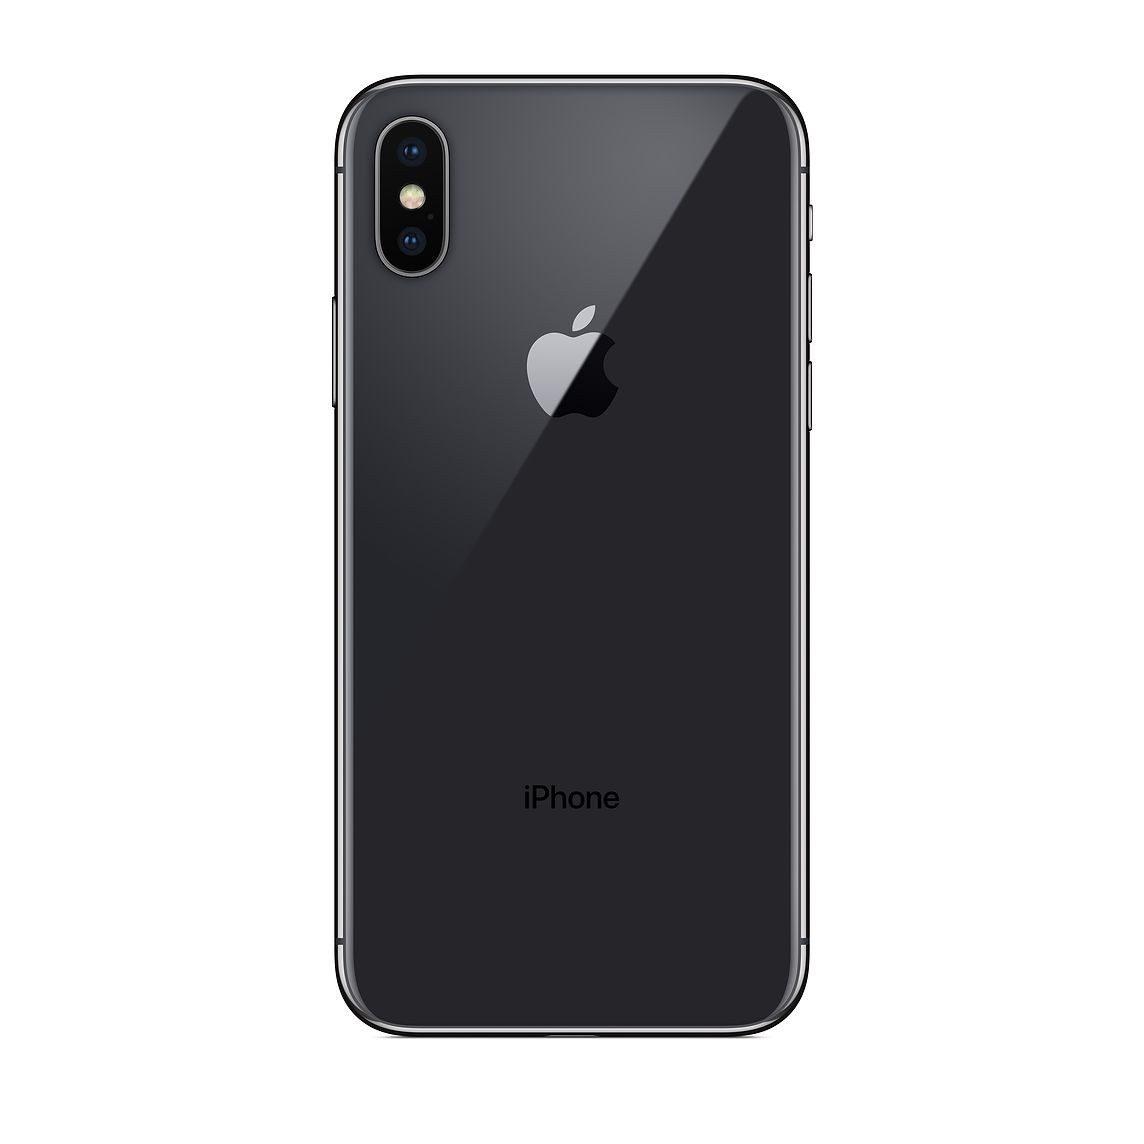 IphoneX glass fame